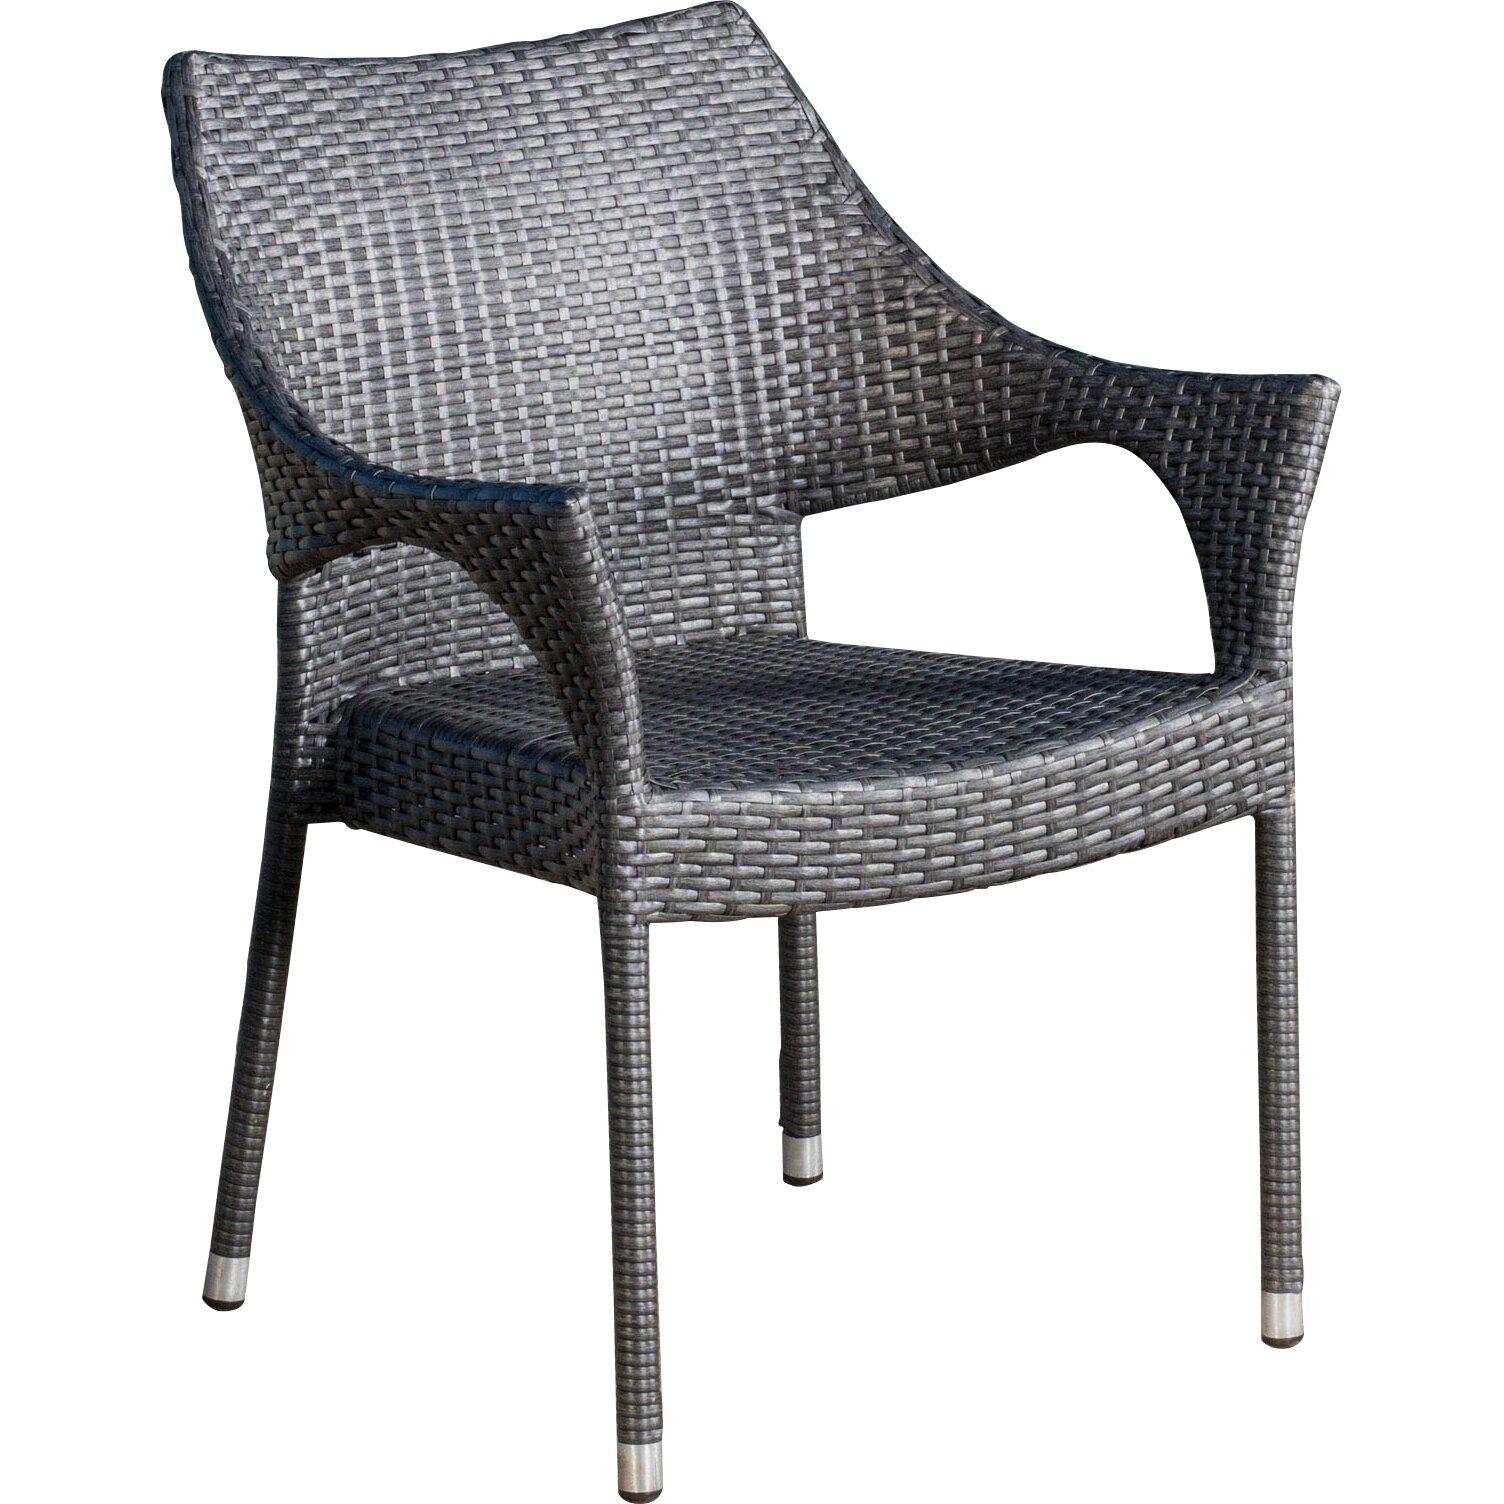 White Rocking Chair Cushions Design ~ Home & Interior Design